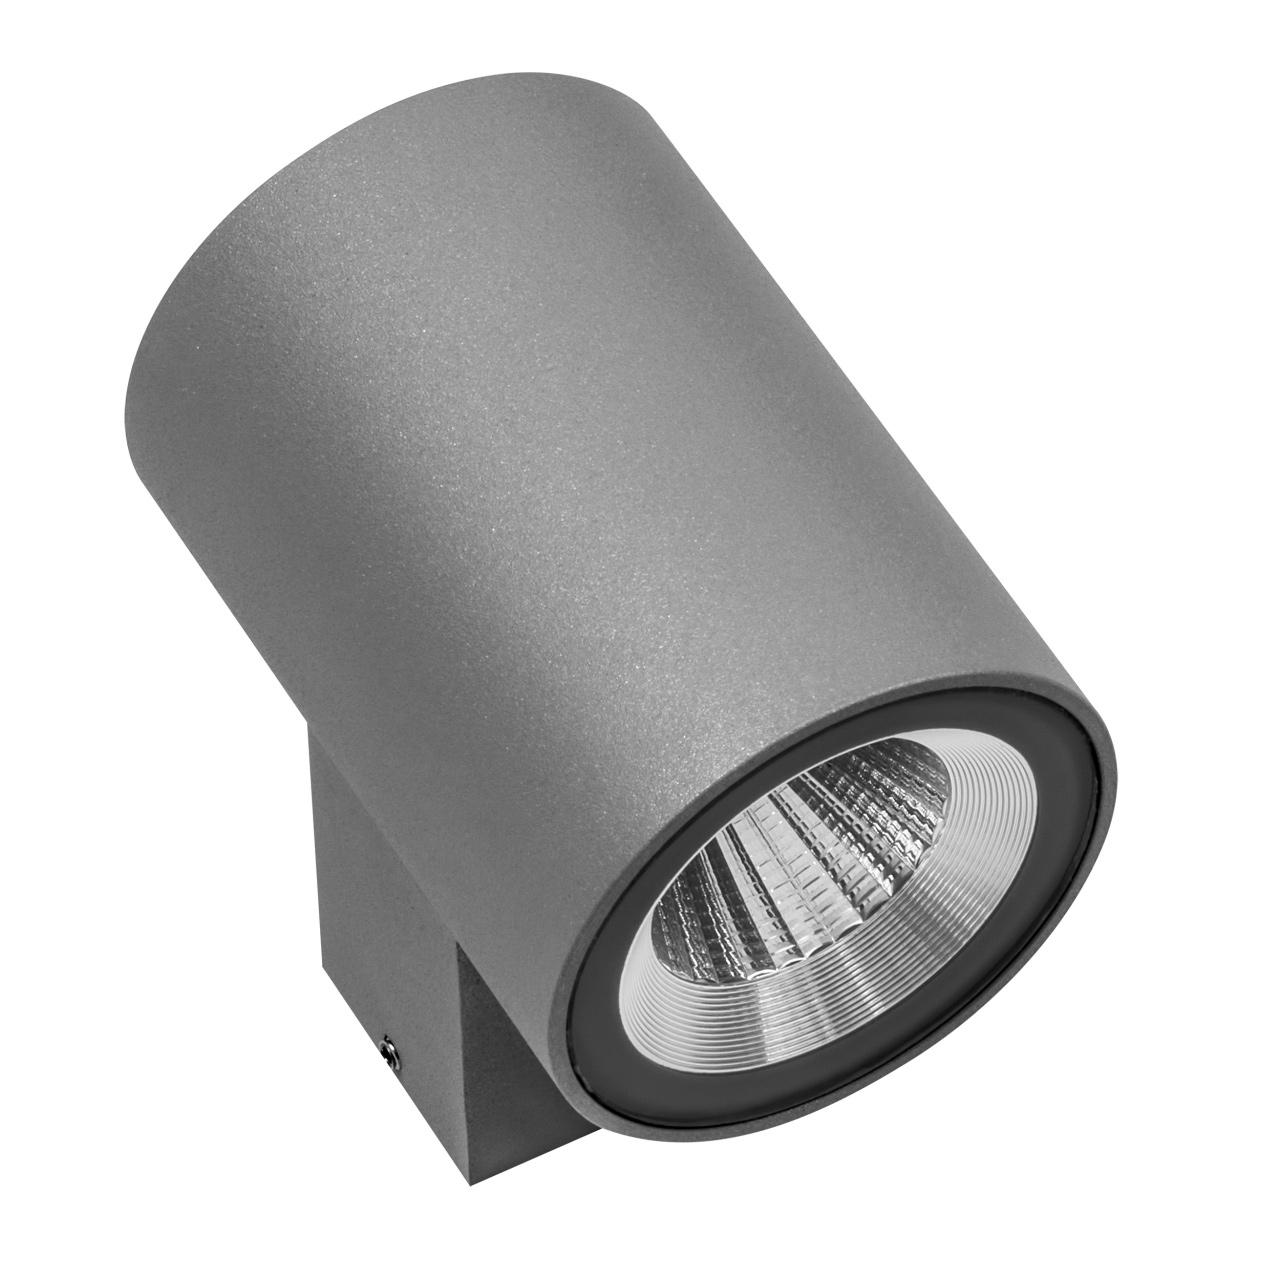 Светильник Paro LED 2*6W 960LM 24G серый 3000K IP65 Lightstar 351692